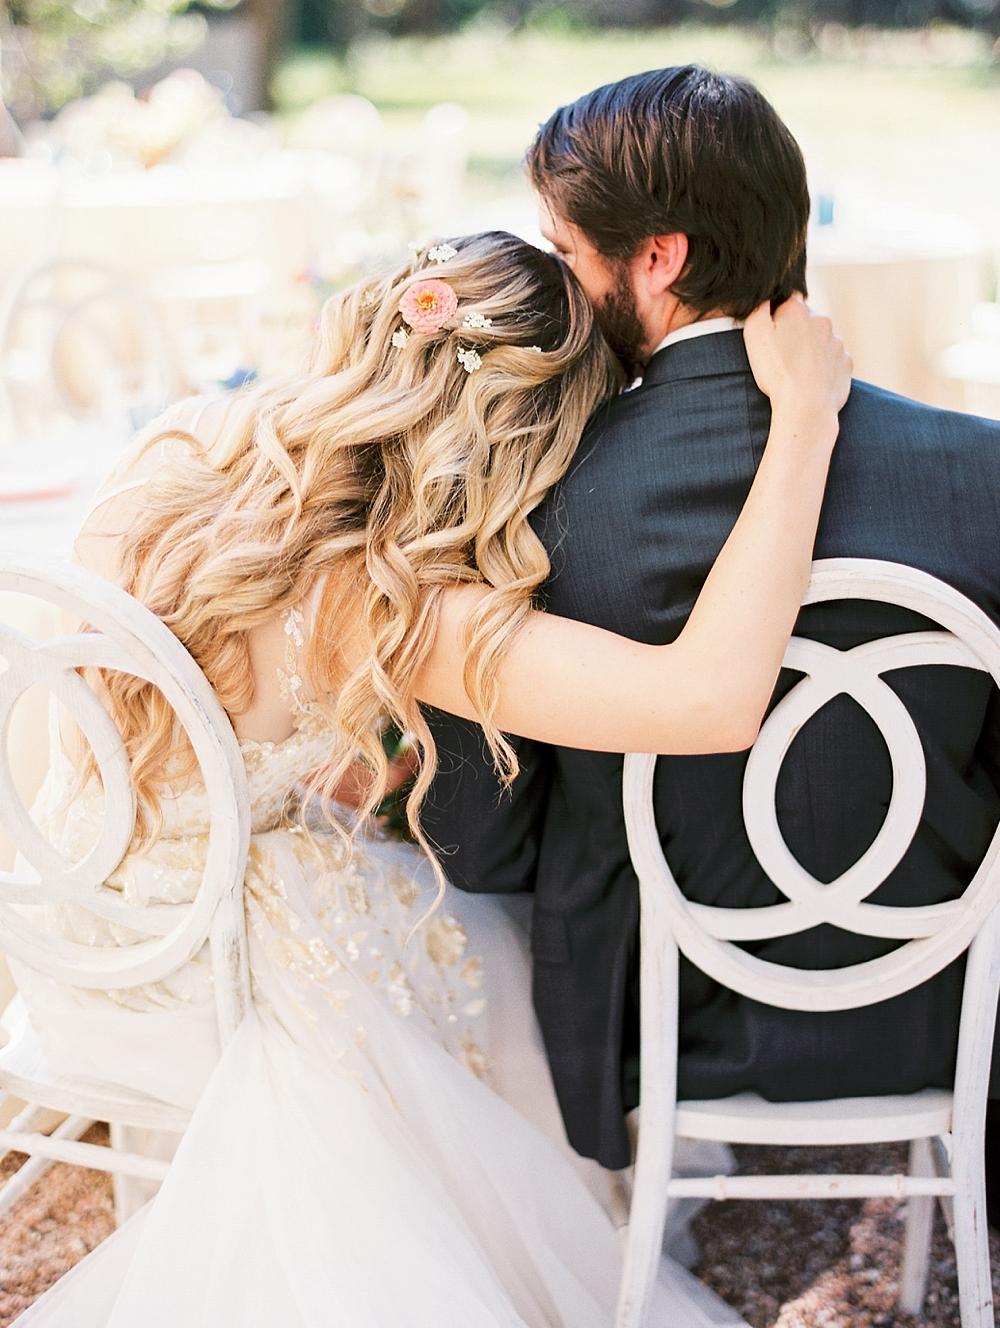 Kristin-La-Voie-Photography-Austin-Wedding-Photographer-the-grand-lady-22